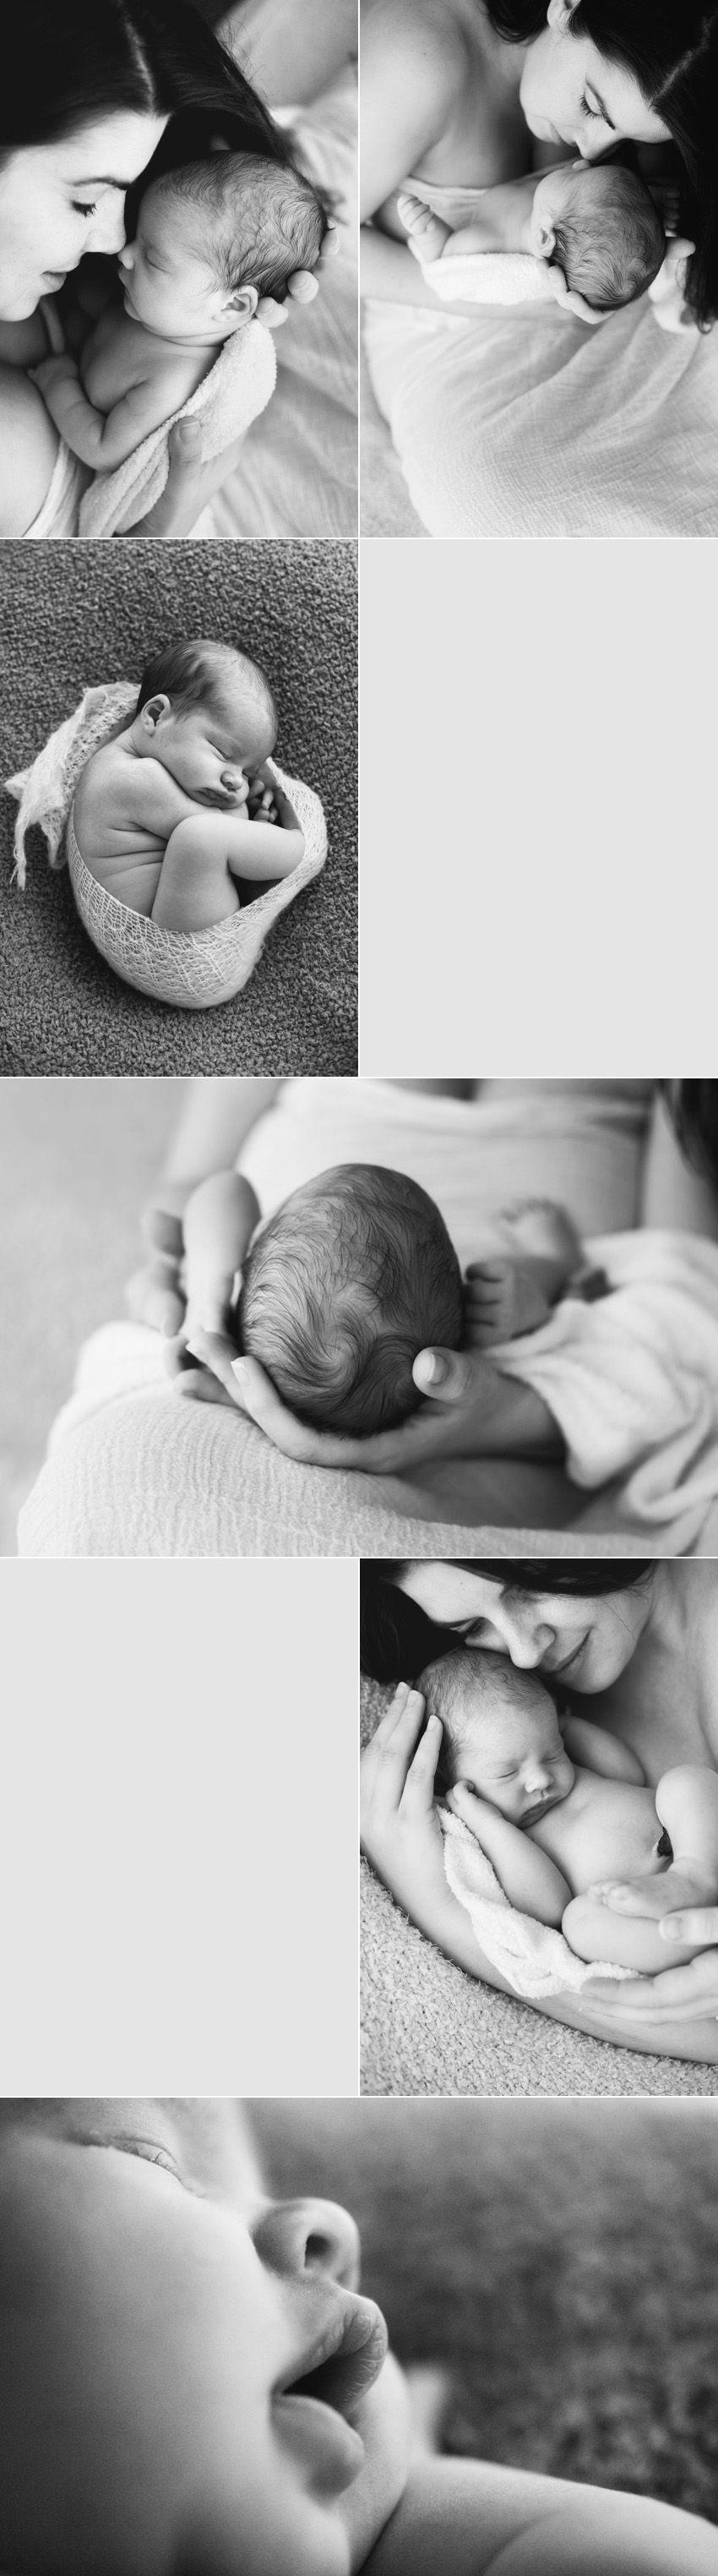 Raye Lawe & her beautiful baby girl photographed by Ashley Skjaveland.